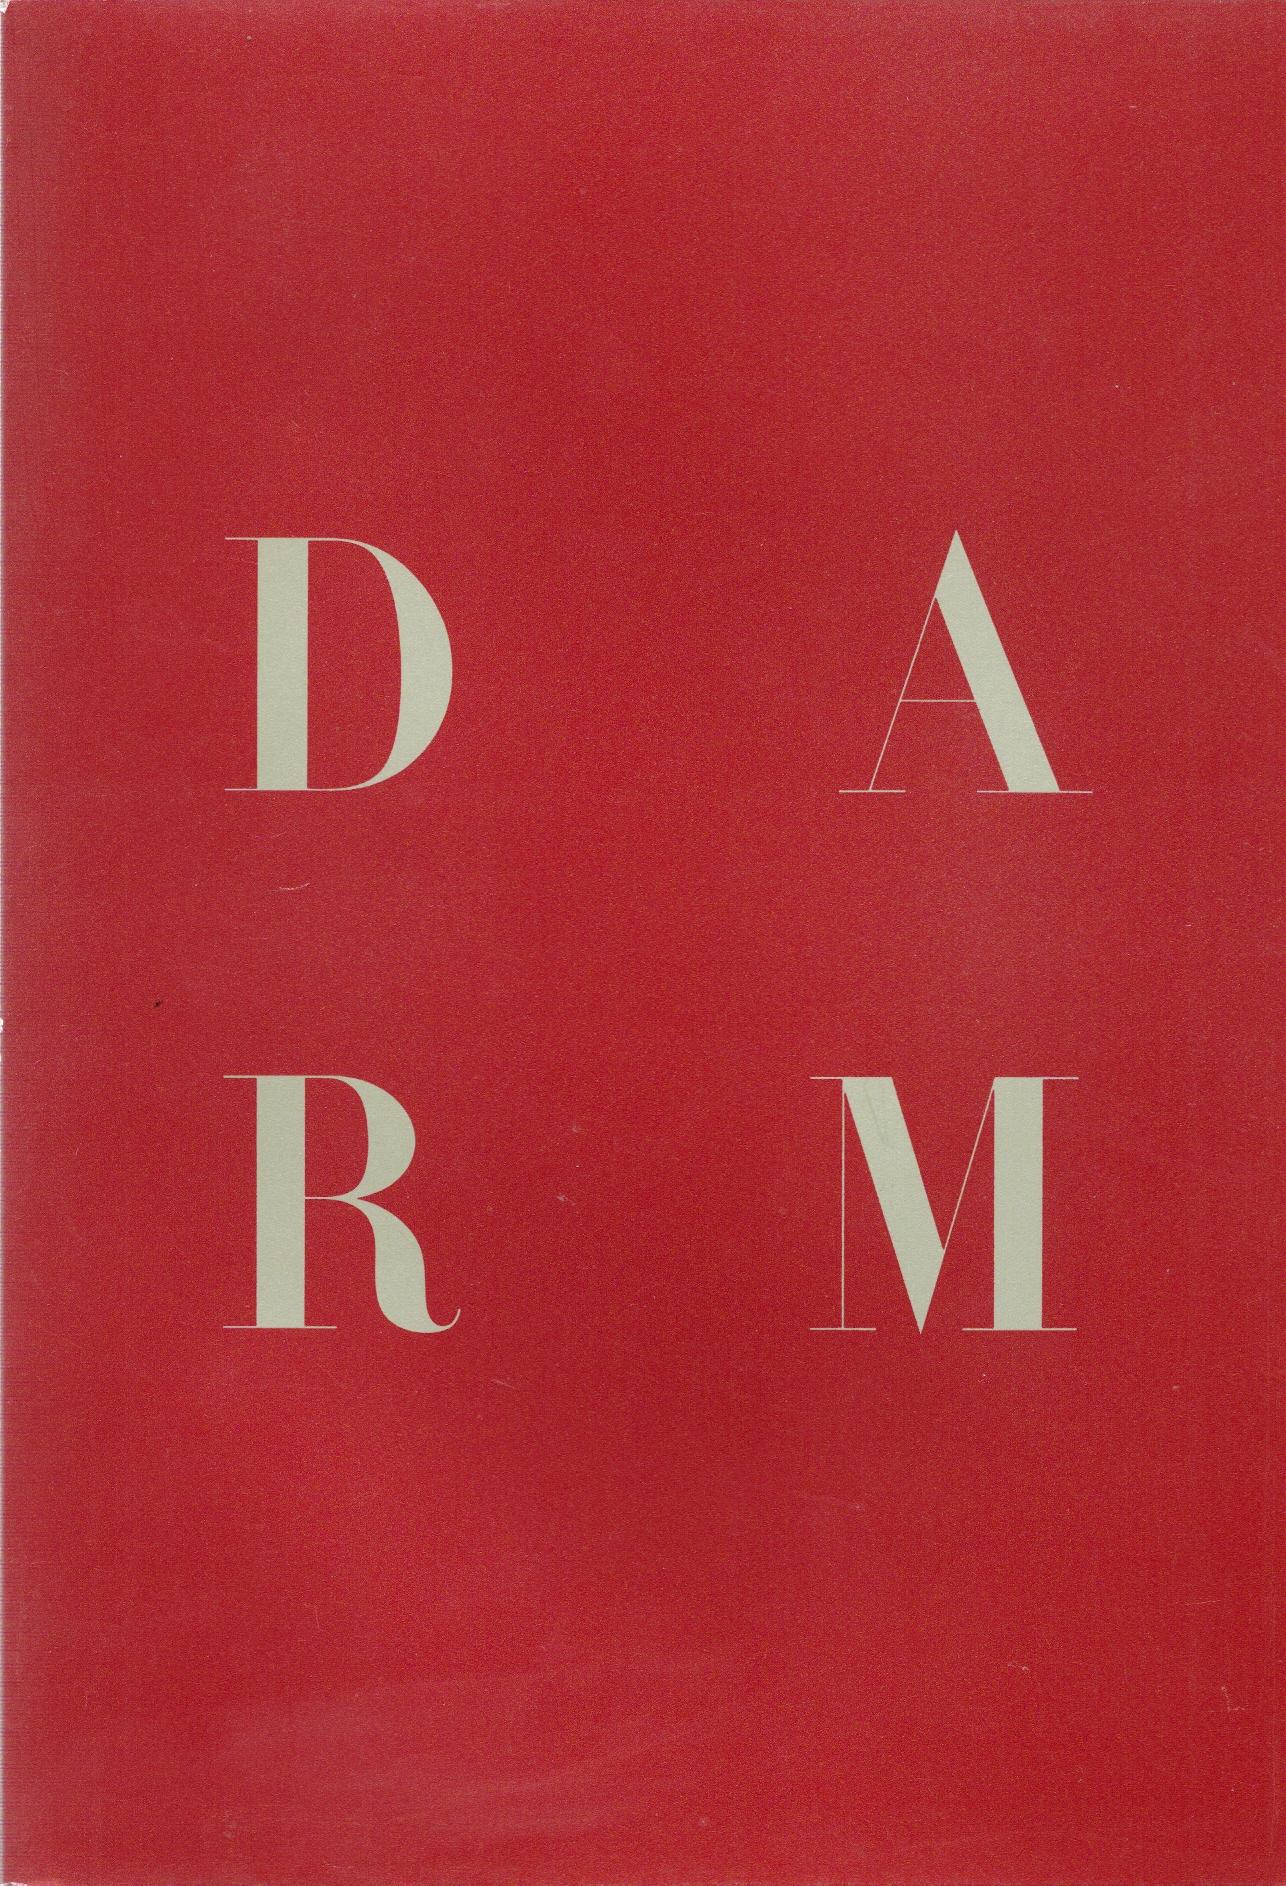 D.A.R.M Okkupation , 1990